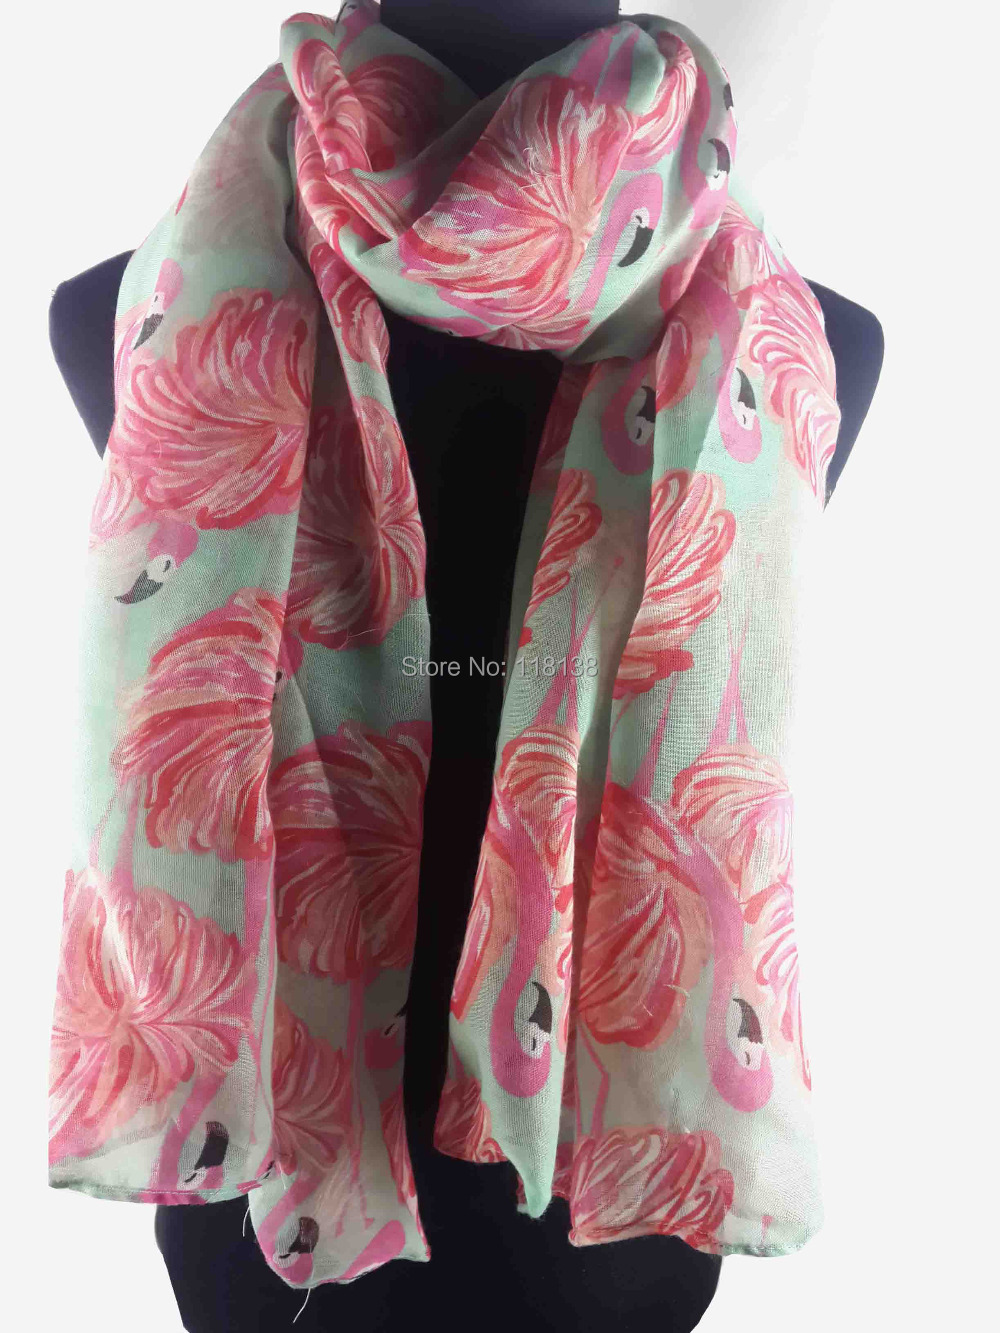 Flamingo Print Women's Scarf Wrap Shawl Hijab Women's Accessories Gift Thanksgiving Day, Free Shipping(China (Mainland))